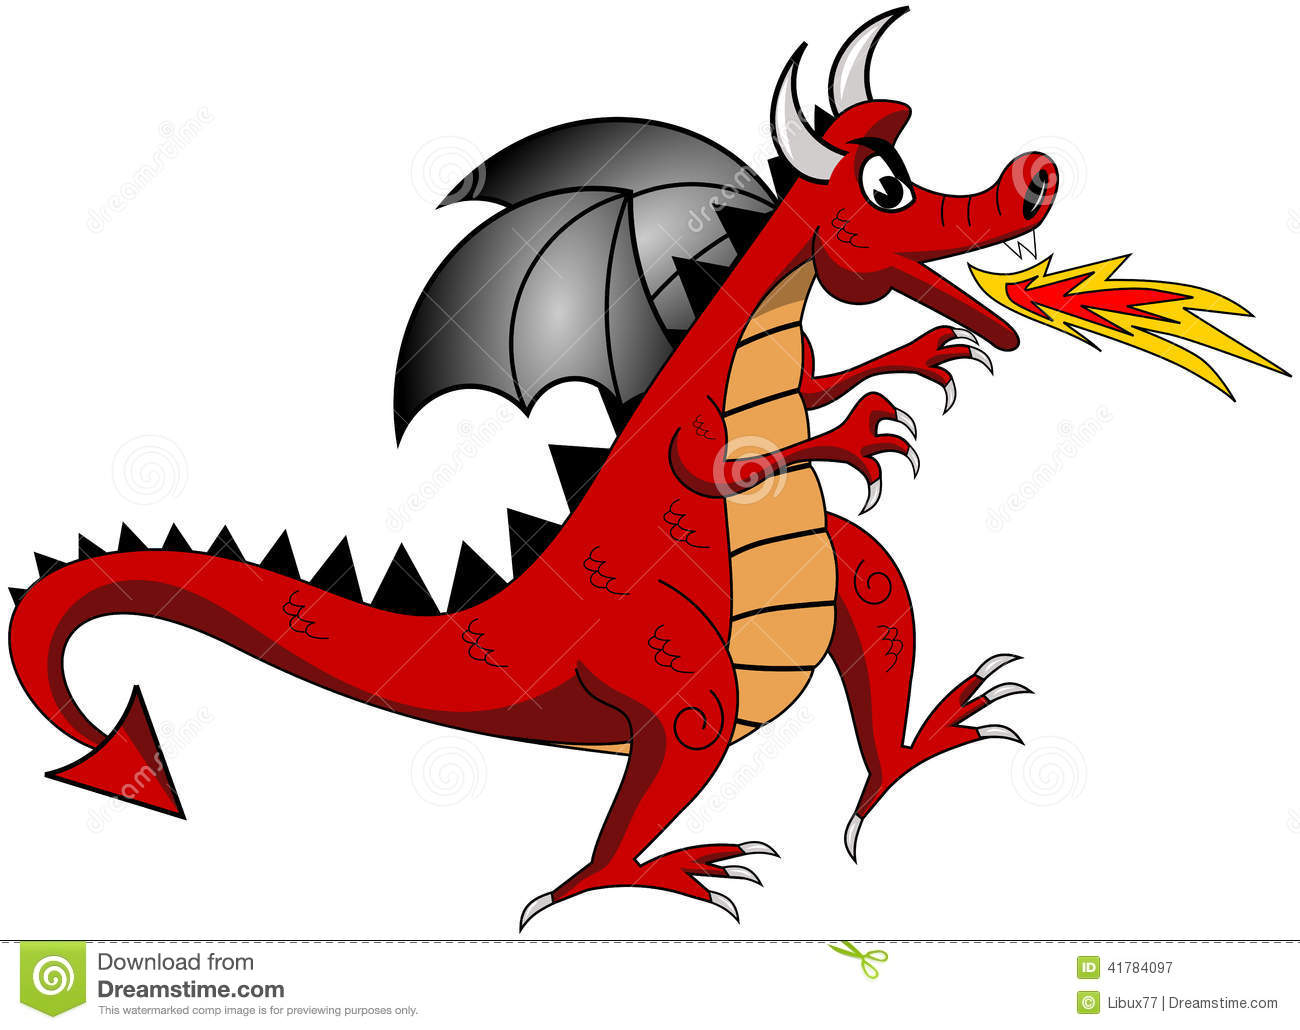 1300x1030 Flame Dragon Clipart, Explore Pictures